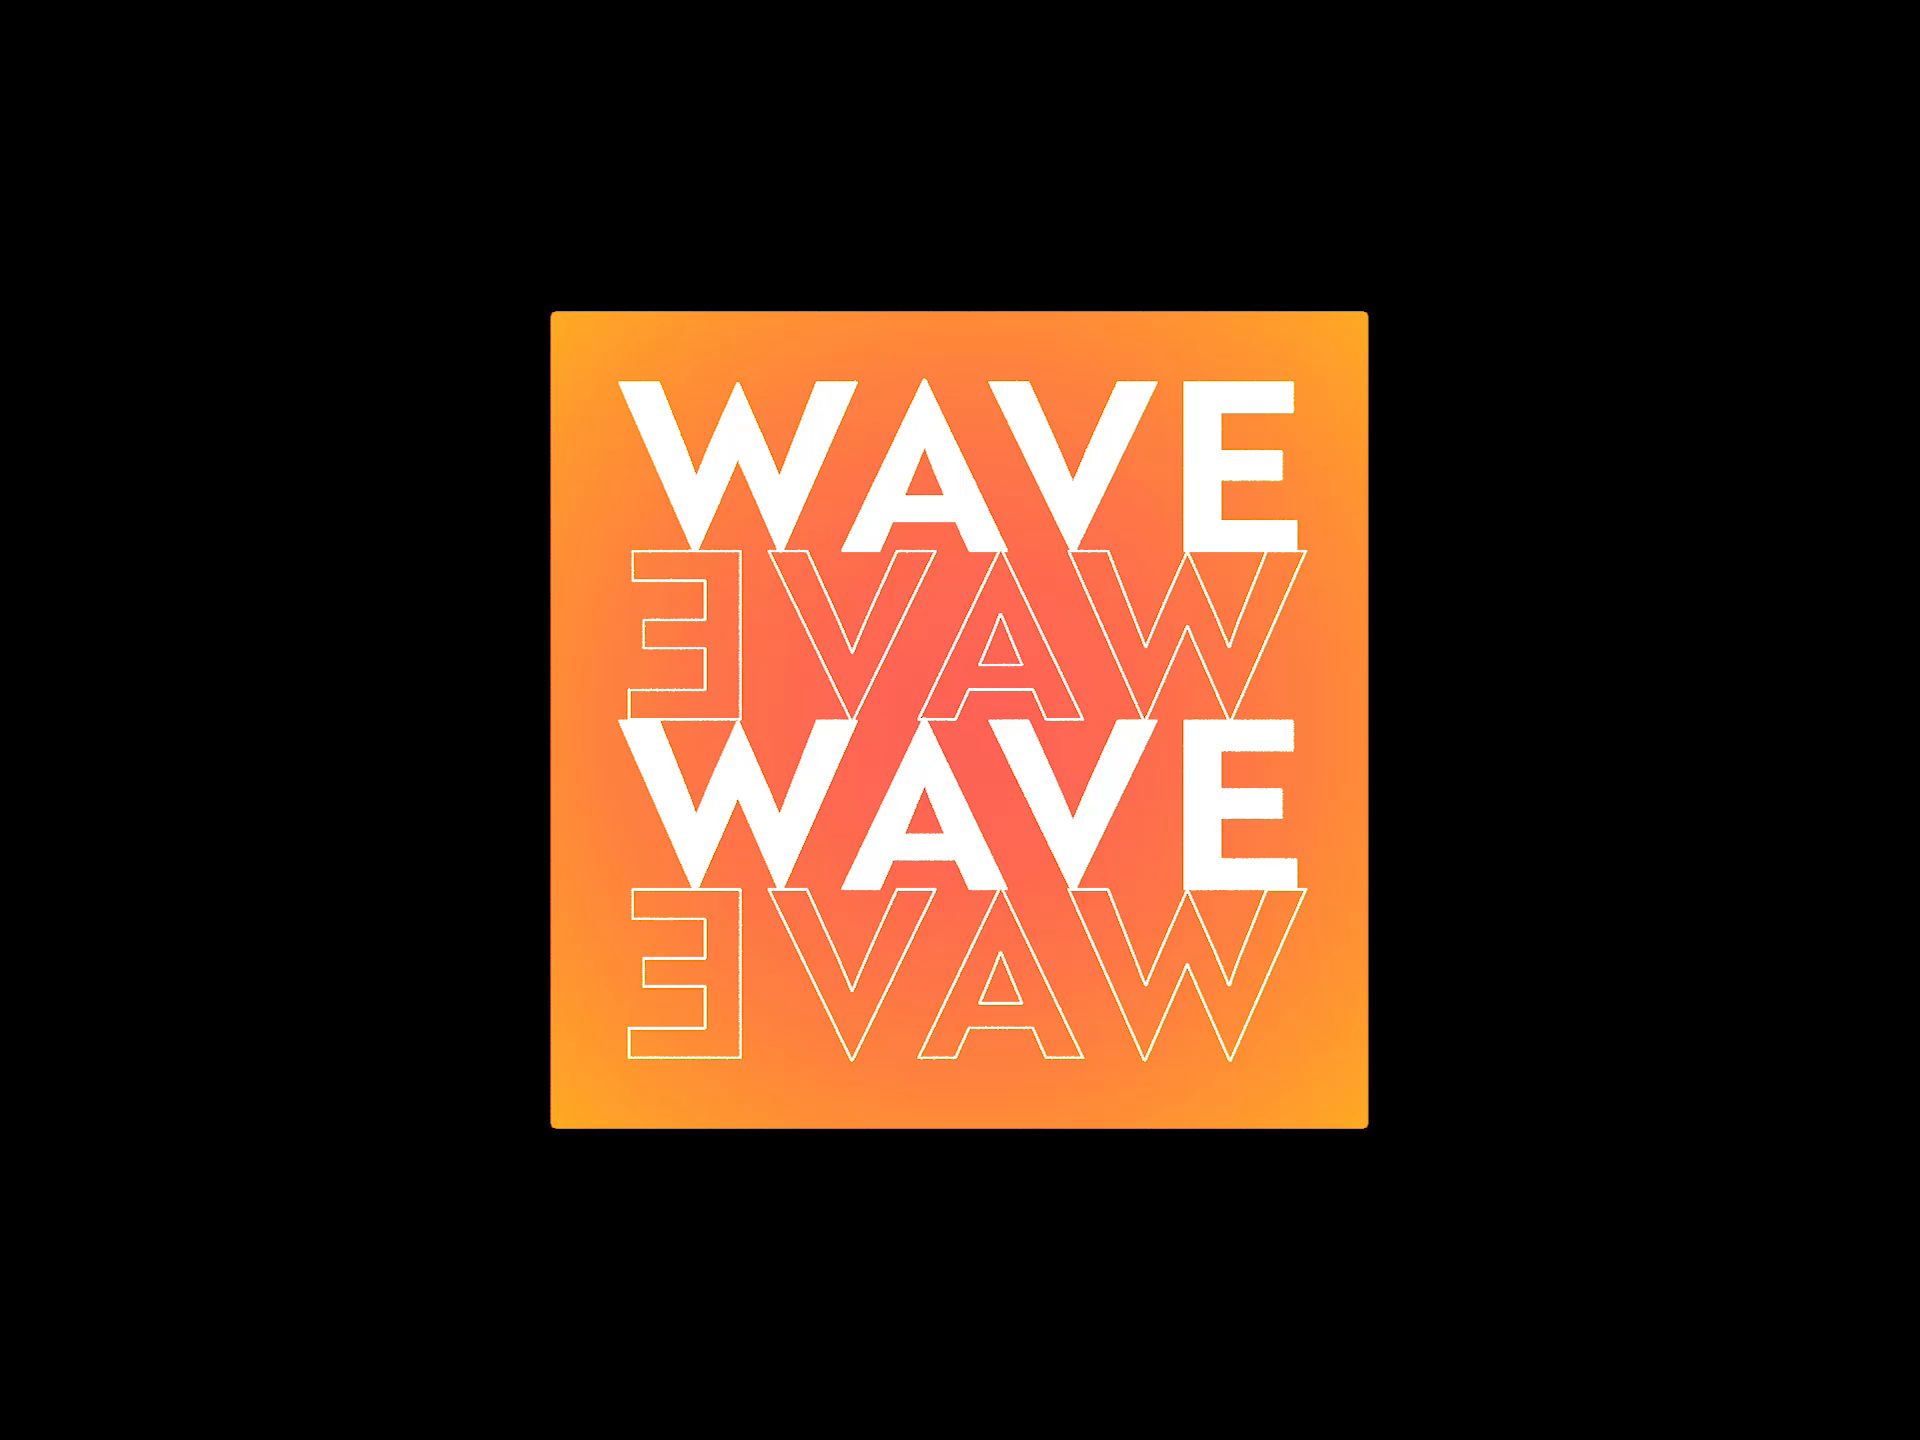 WAVE EVAW FLAG